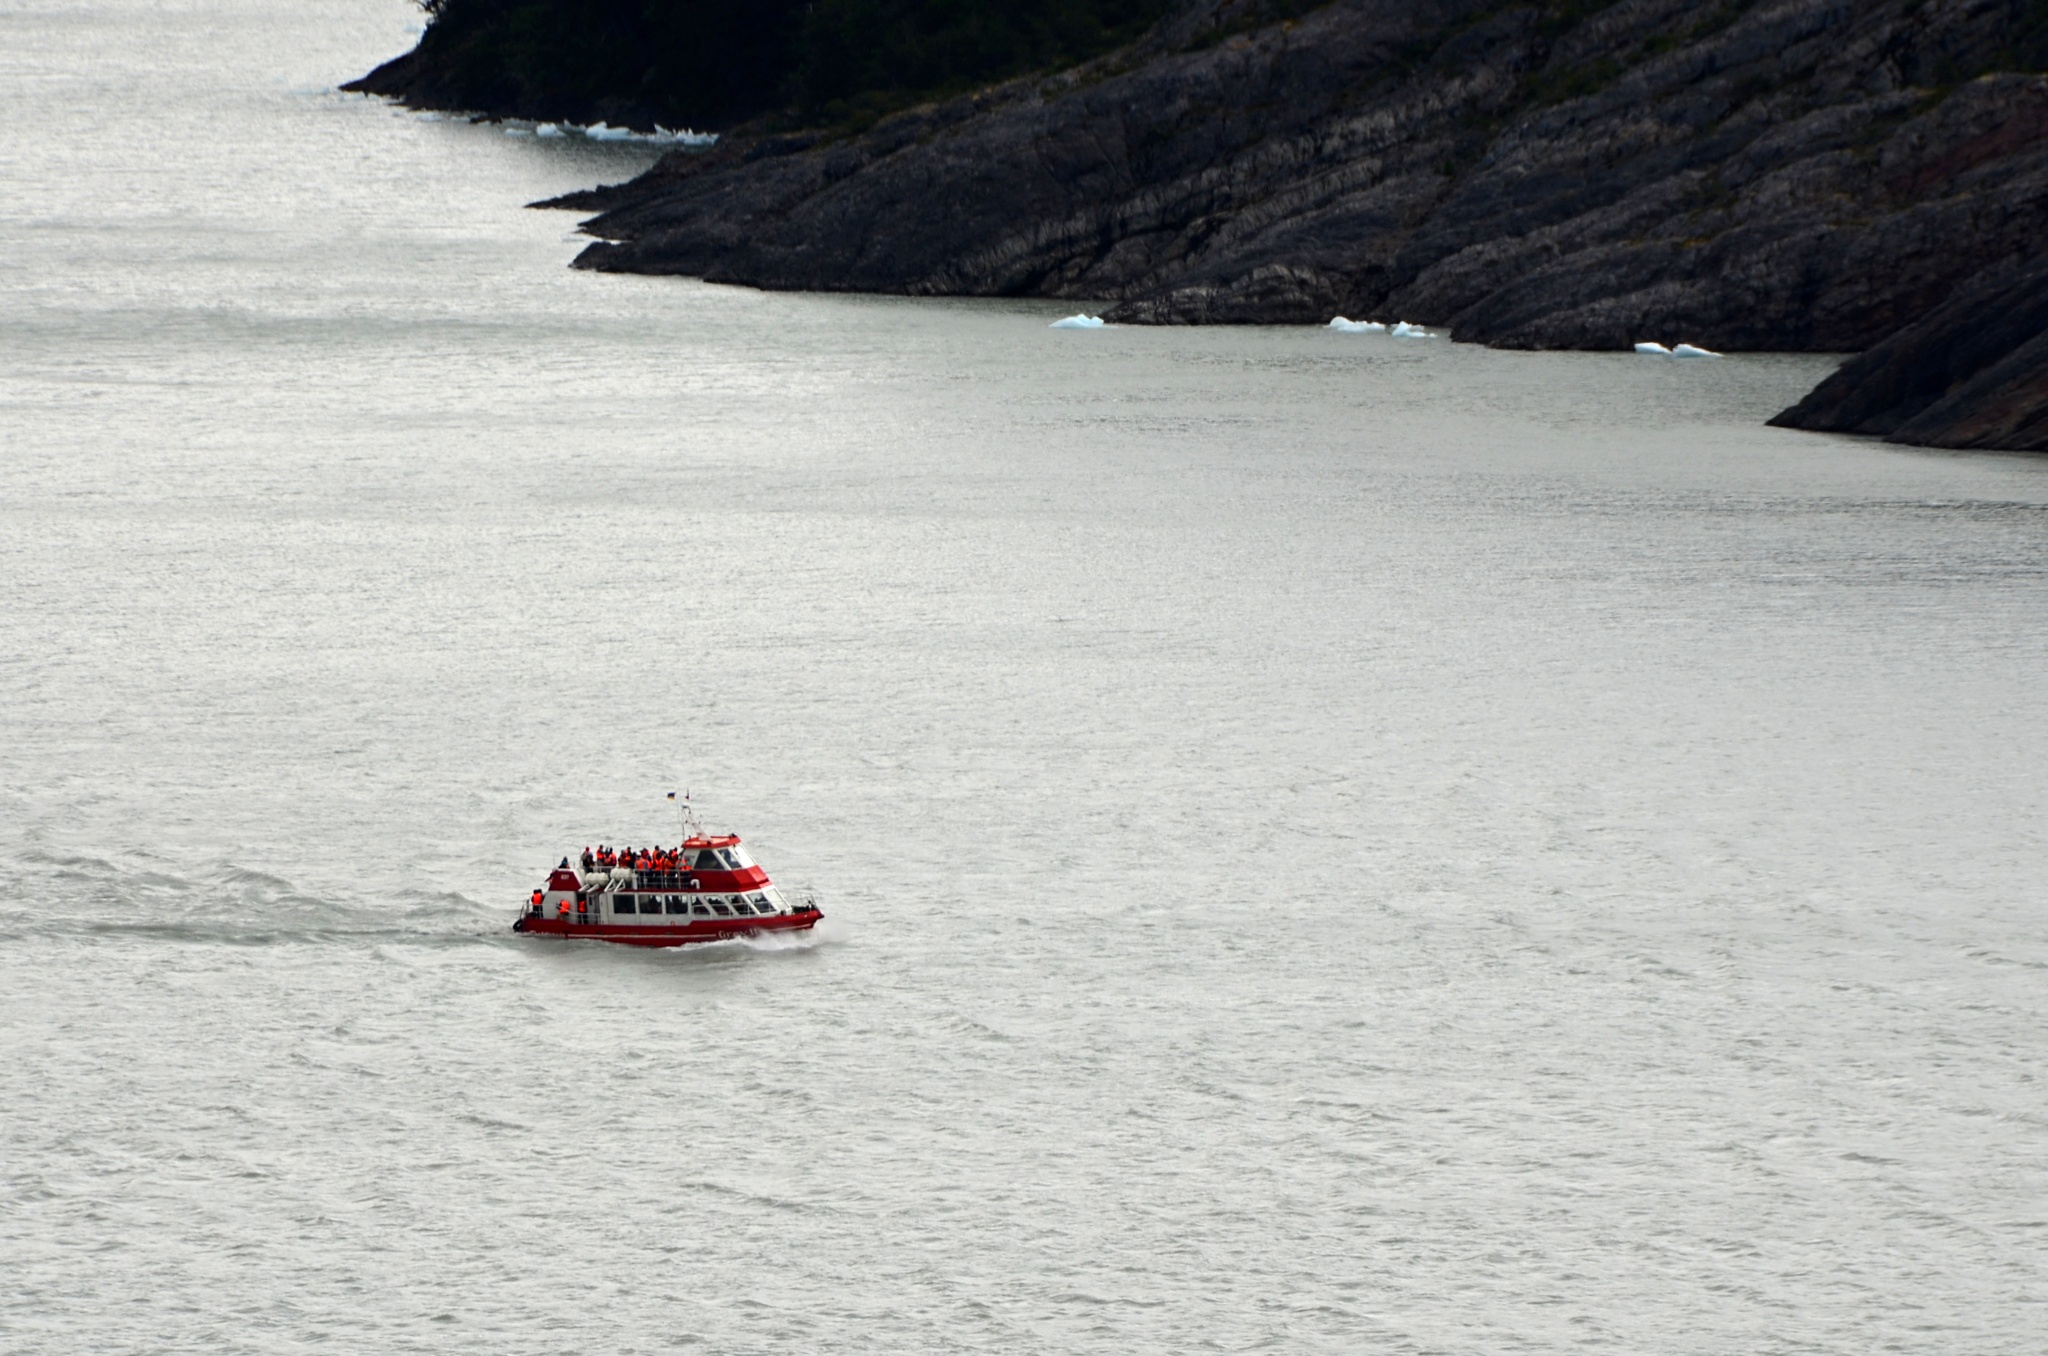 Loď plná turistů